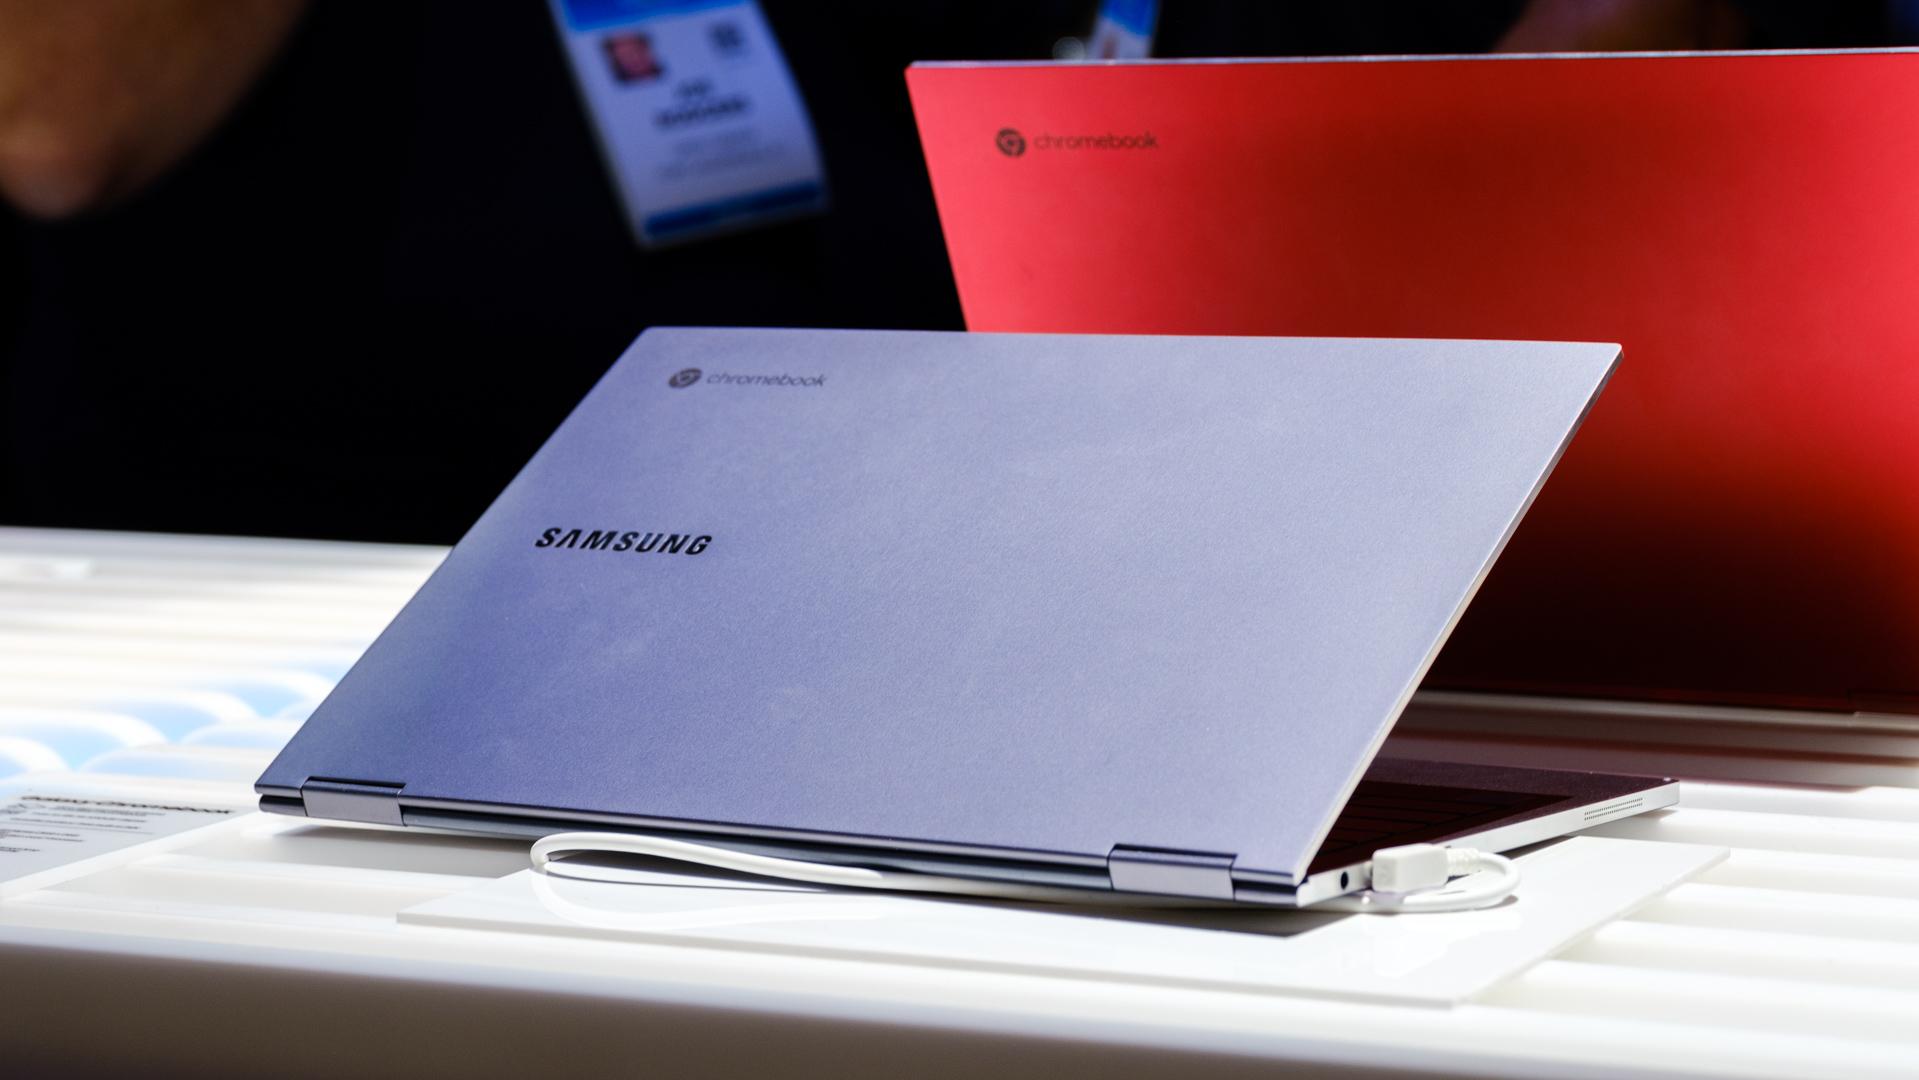 Samsung Galaxy Chromebook back side angled silver